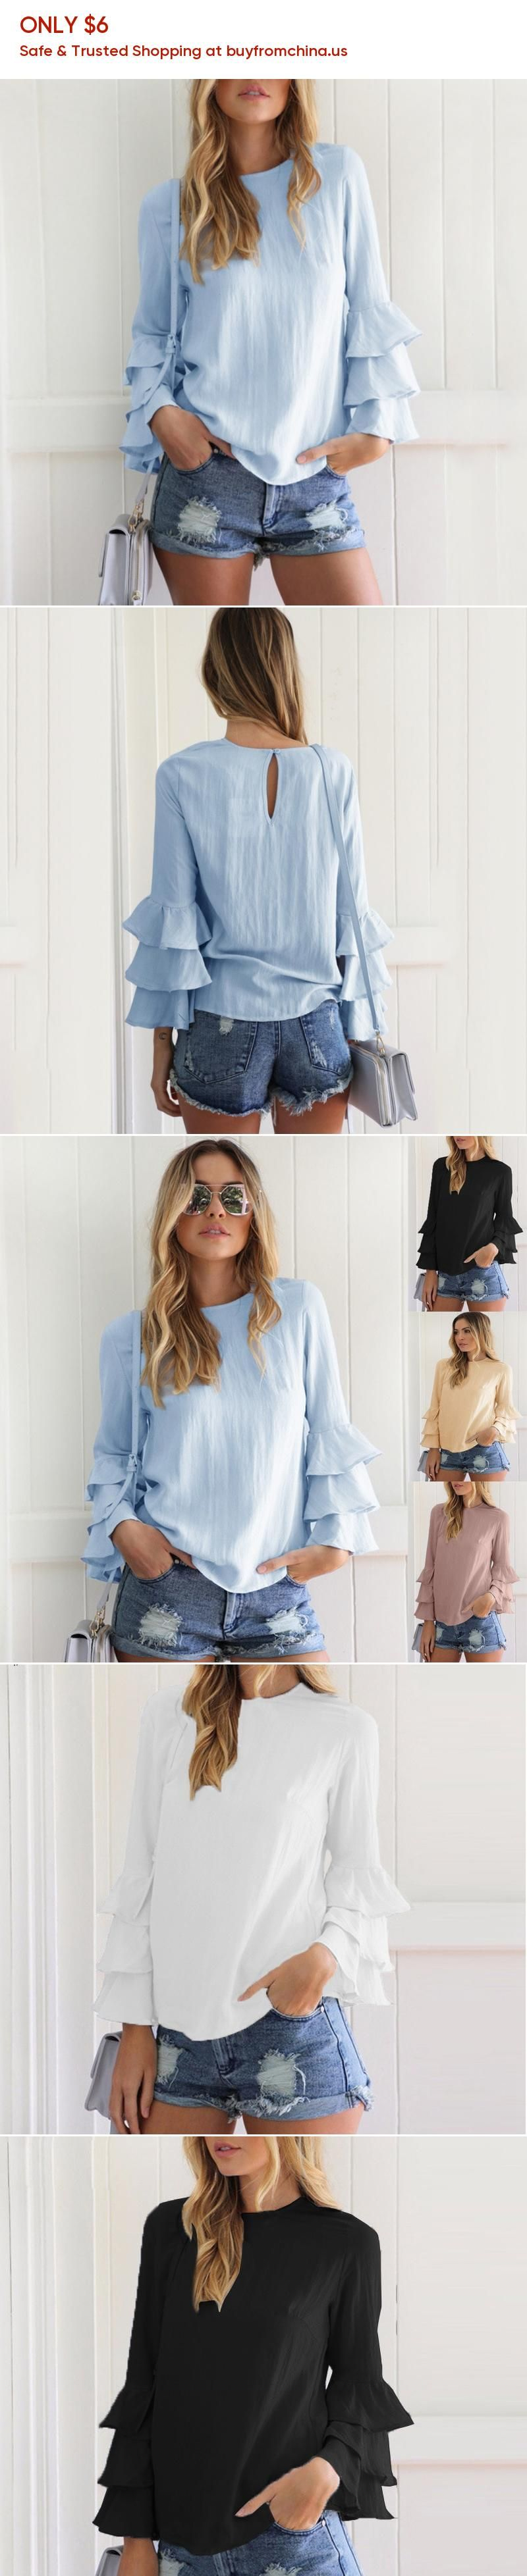 c565a746f9b 2017 Sexy Autumn Back Button Hollow Out Blouses Thin Long Fold Sleeve Women  Blouse Plus Size Women Shirts blusas